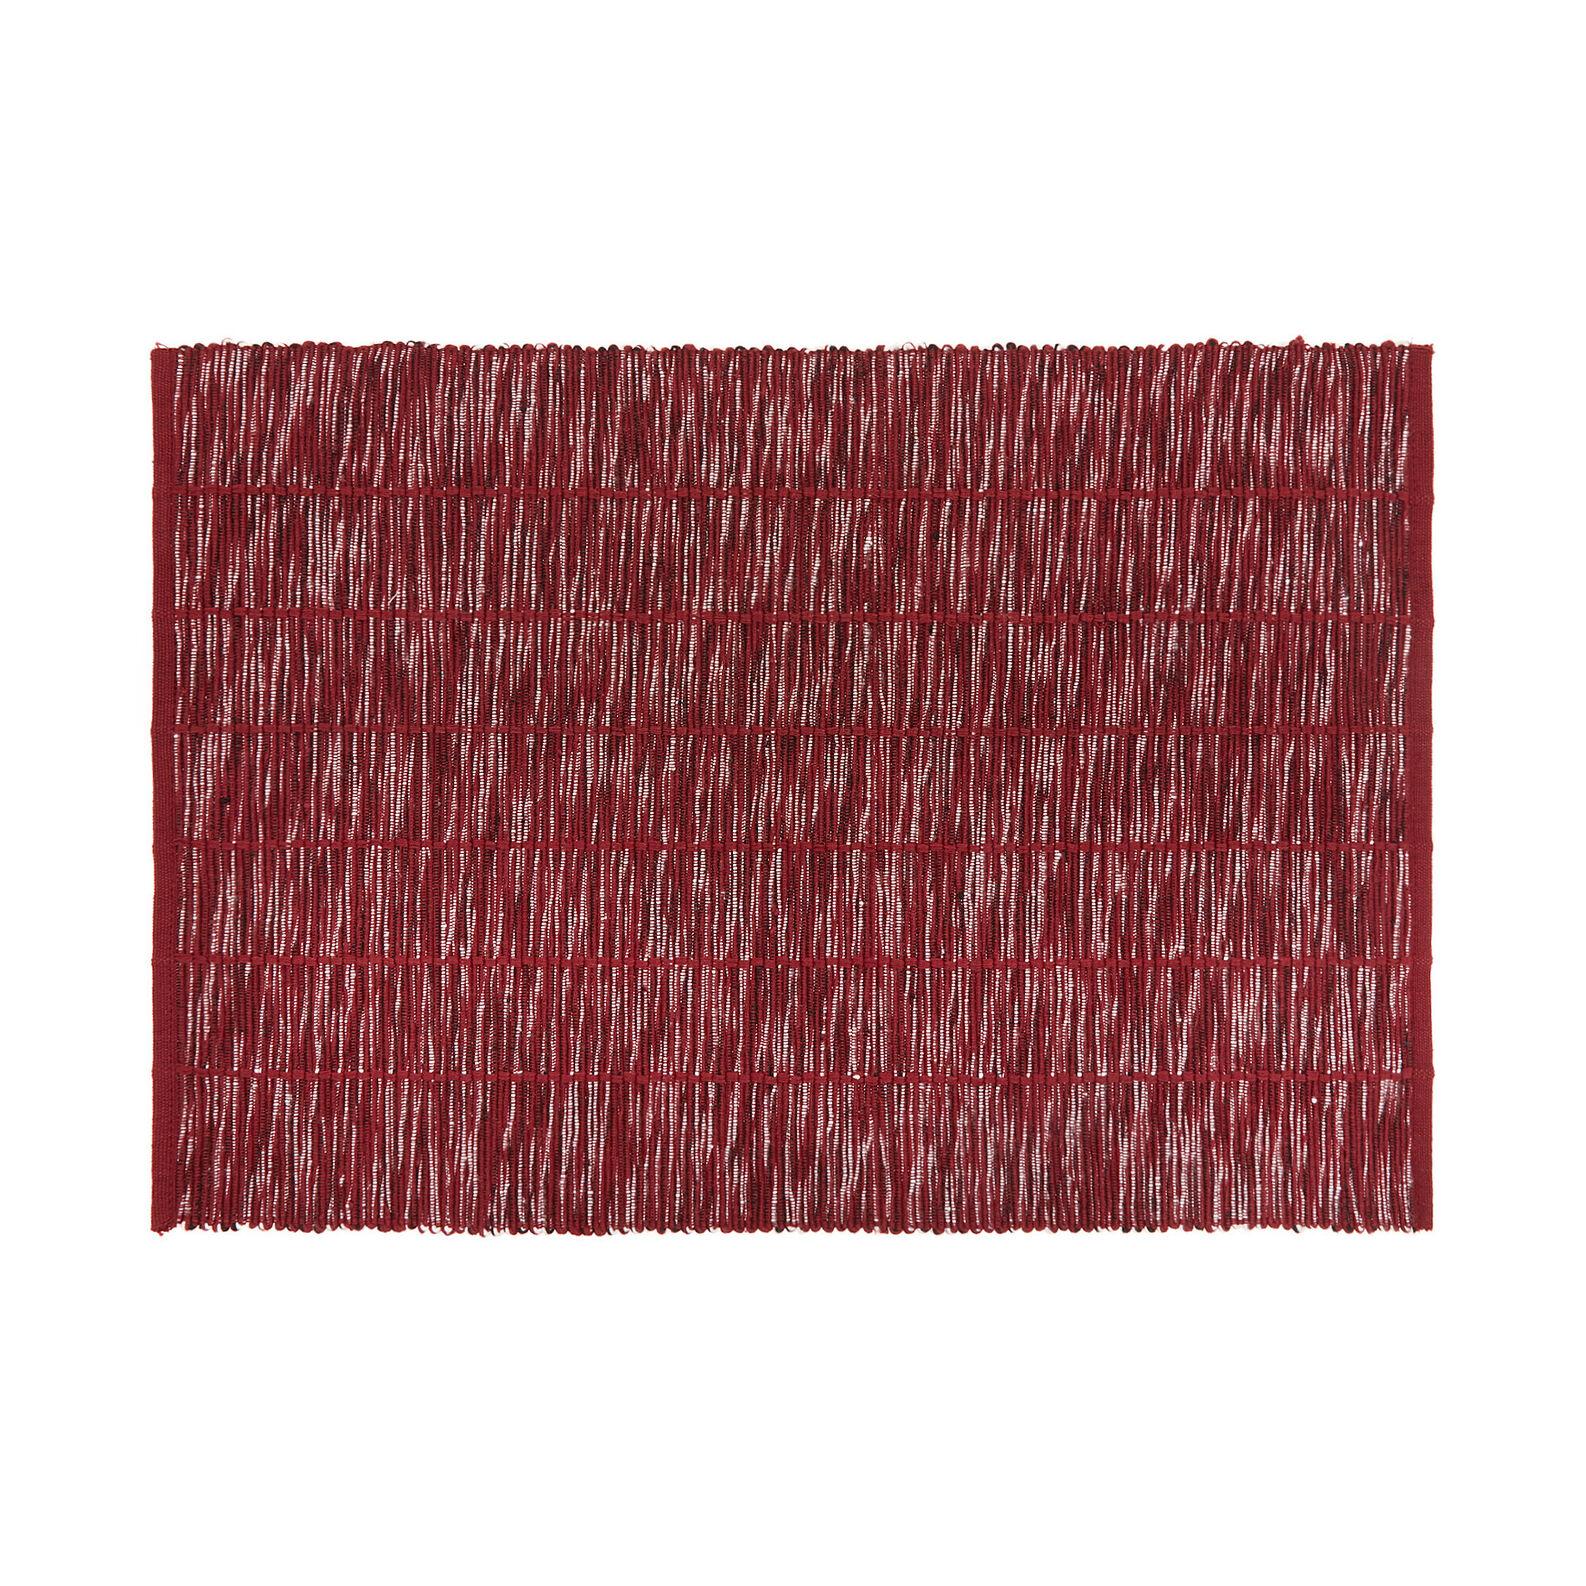 Table mat in 100% cotton mélange